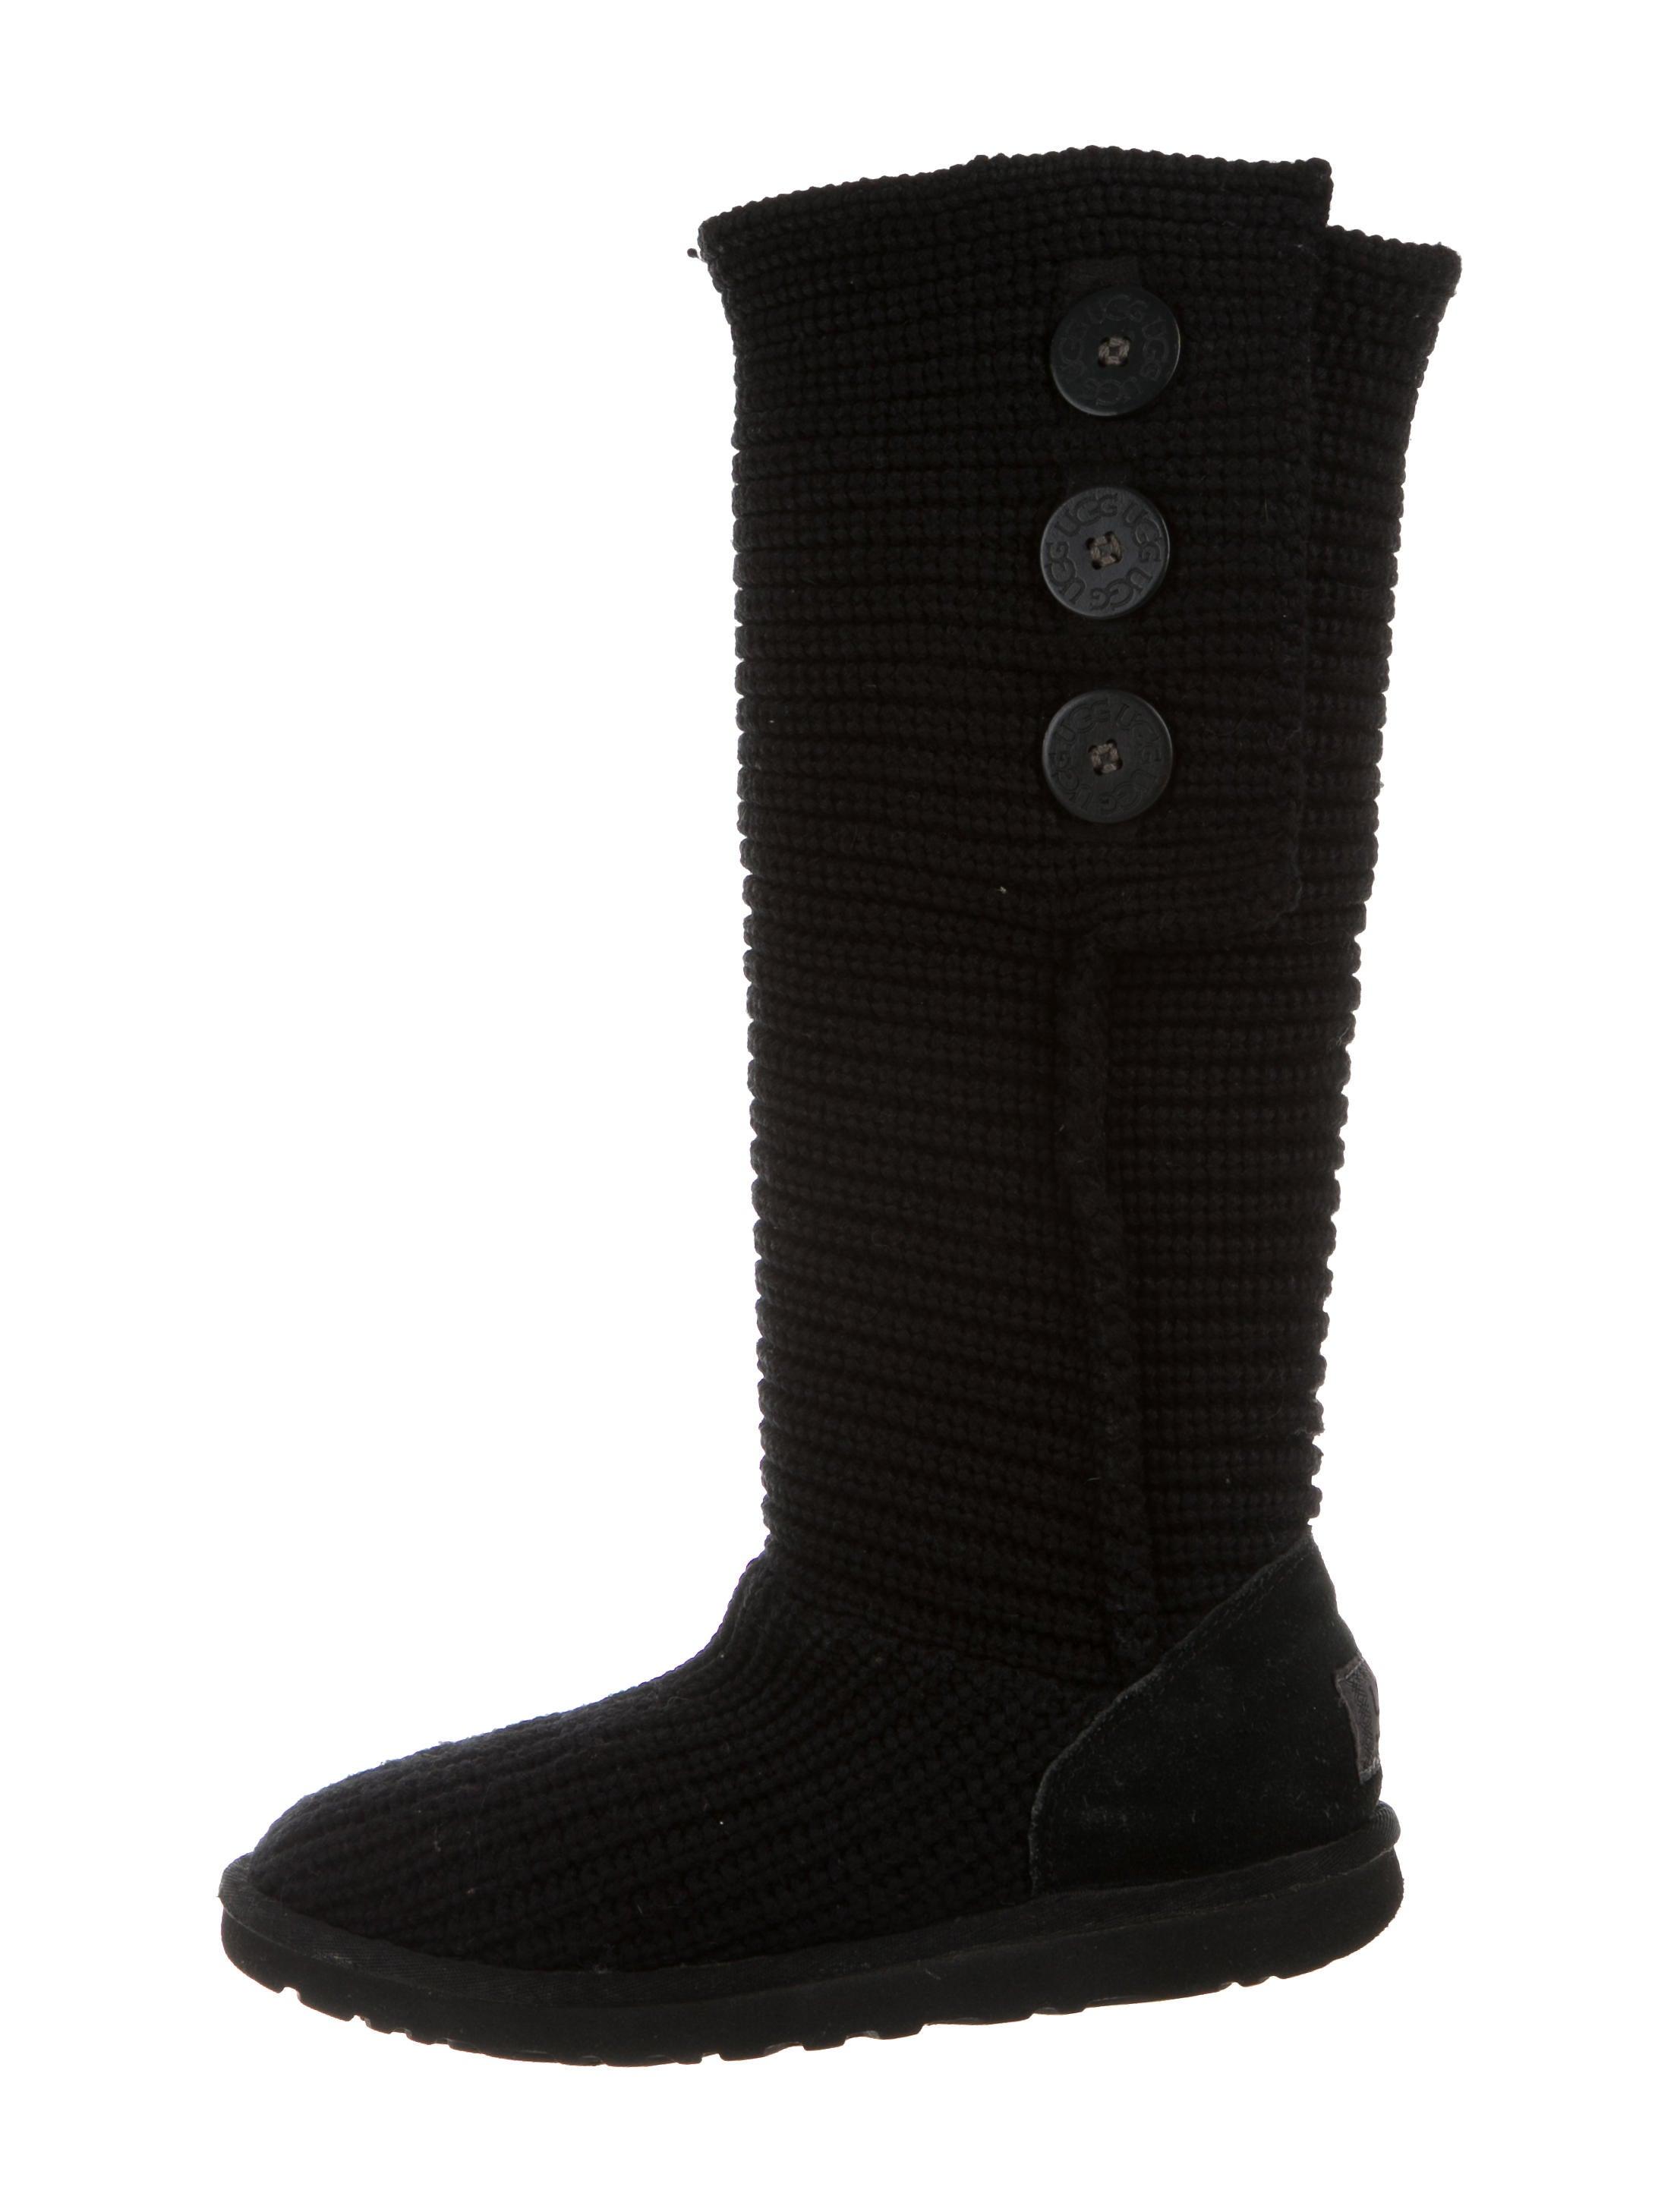 dee46727758 Ugg Boots $500